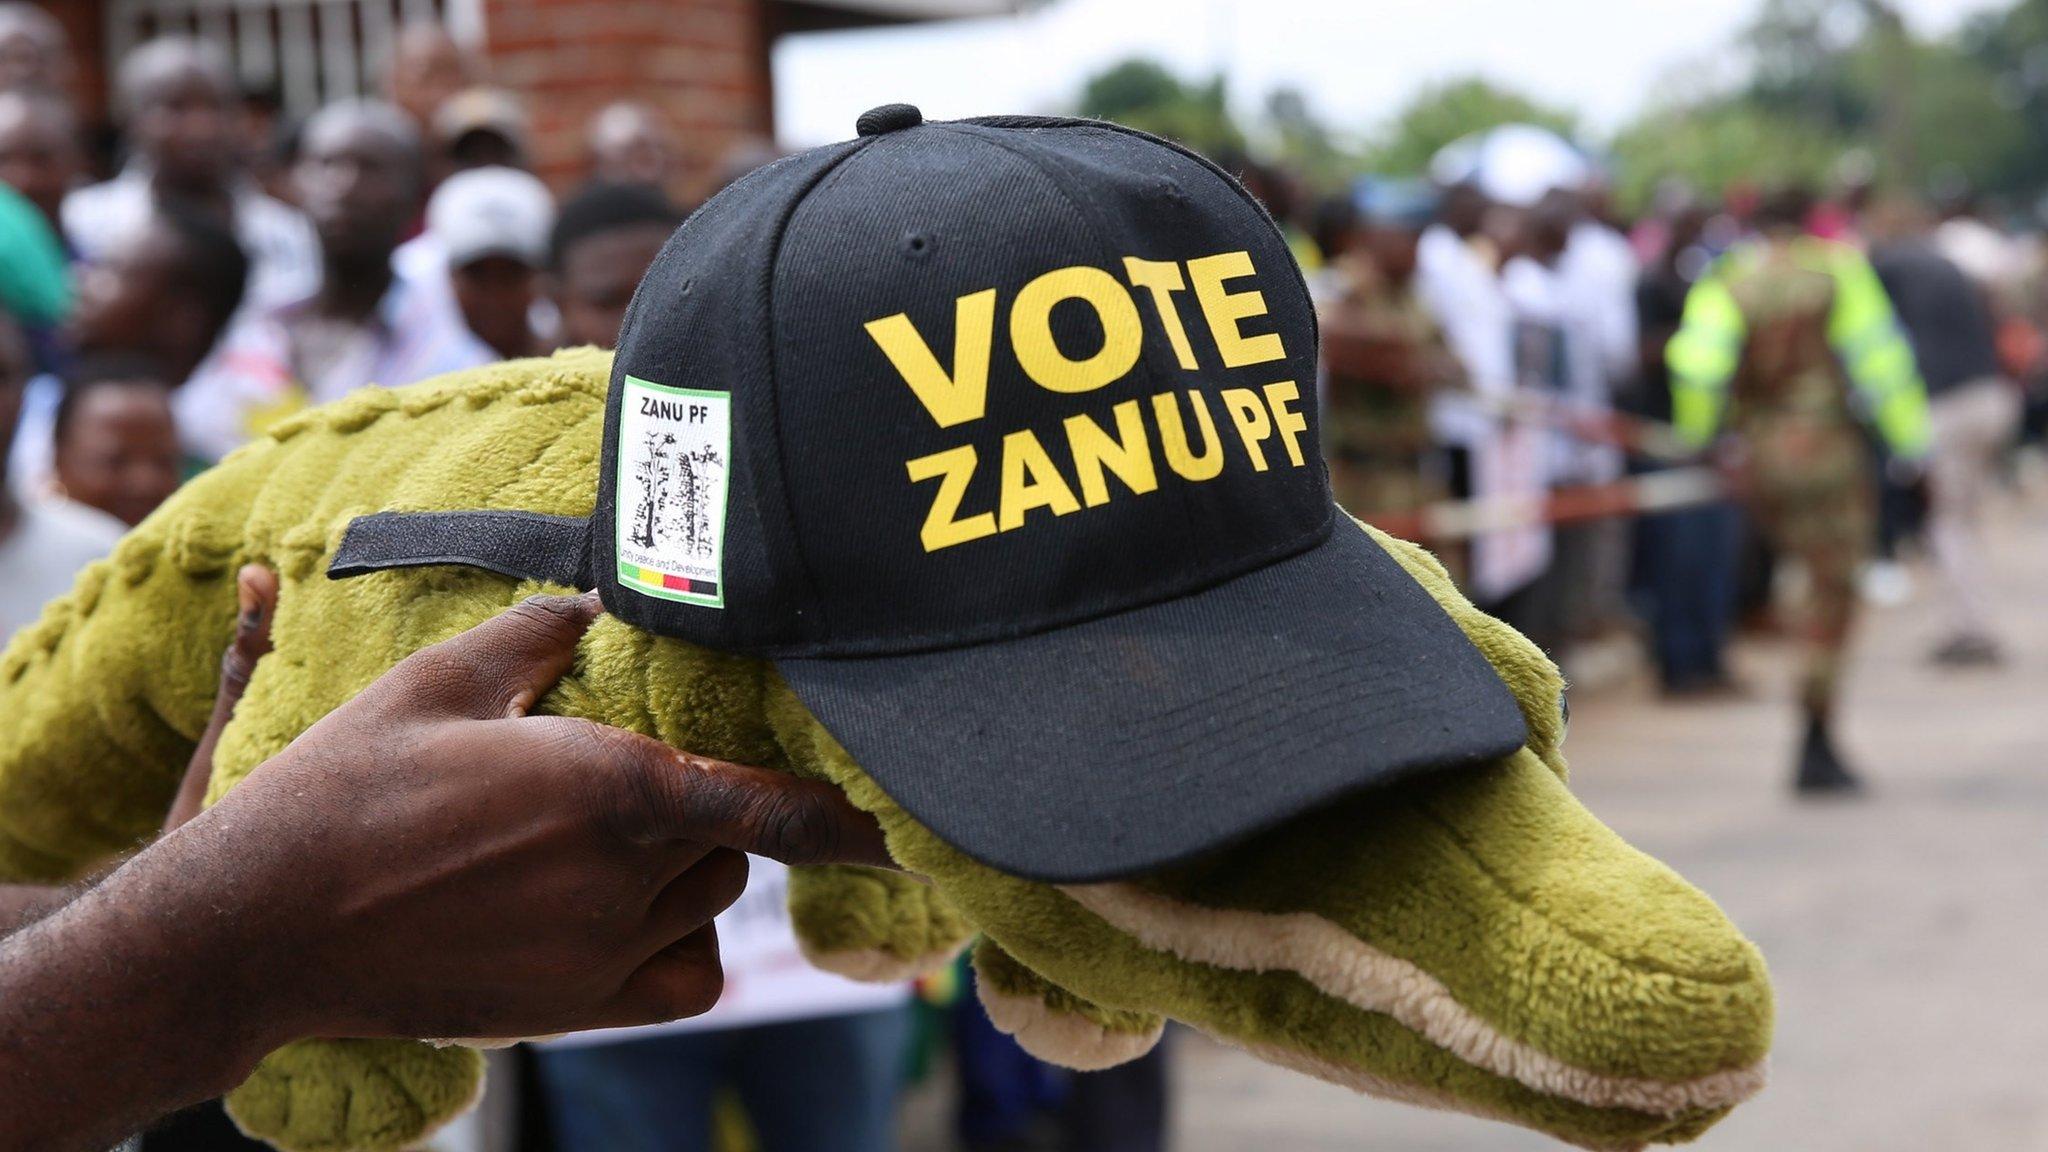 Zanu-PF purges to win back trust